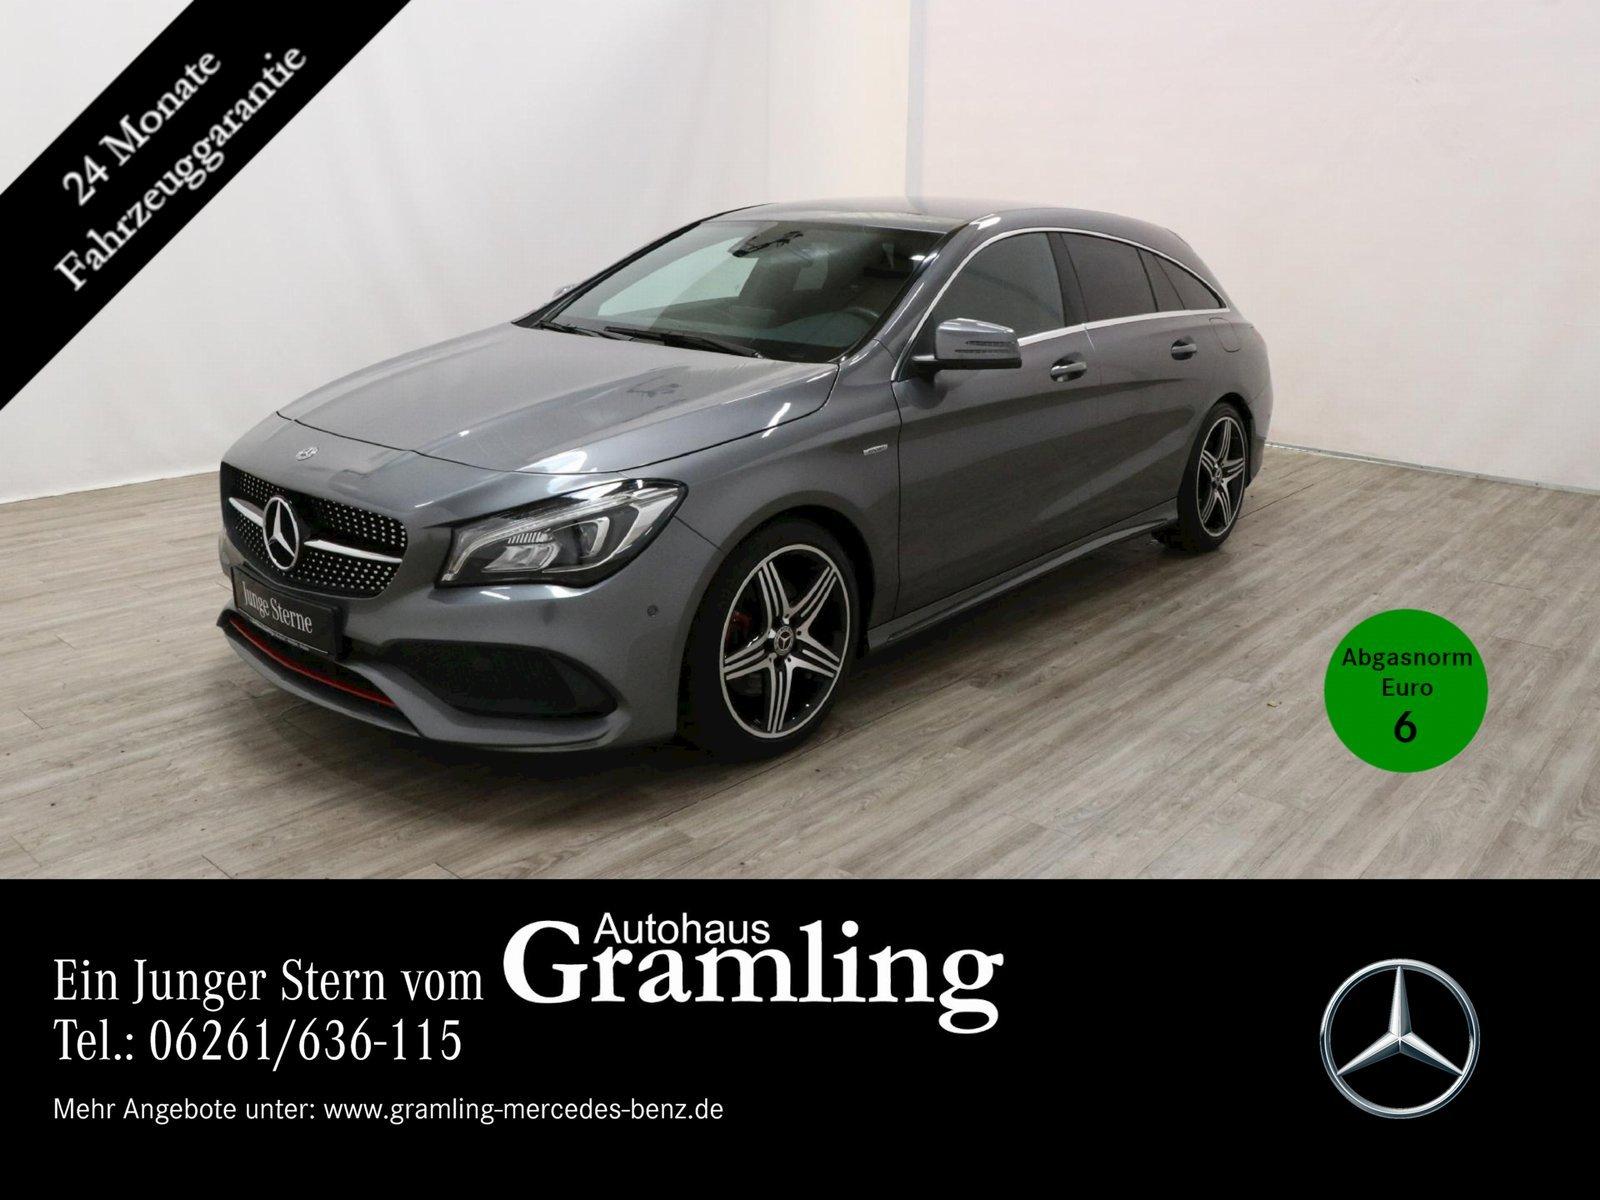 Mercedes-Benz CLA 250 SB 4M Sport AMG*Kamera*Navi*LED*Sitzheiz, Jahr 2017, Benzin